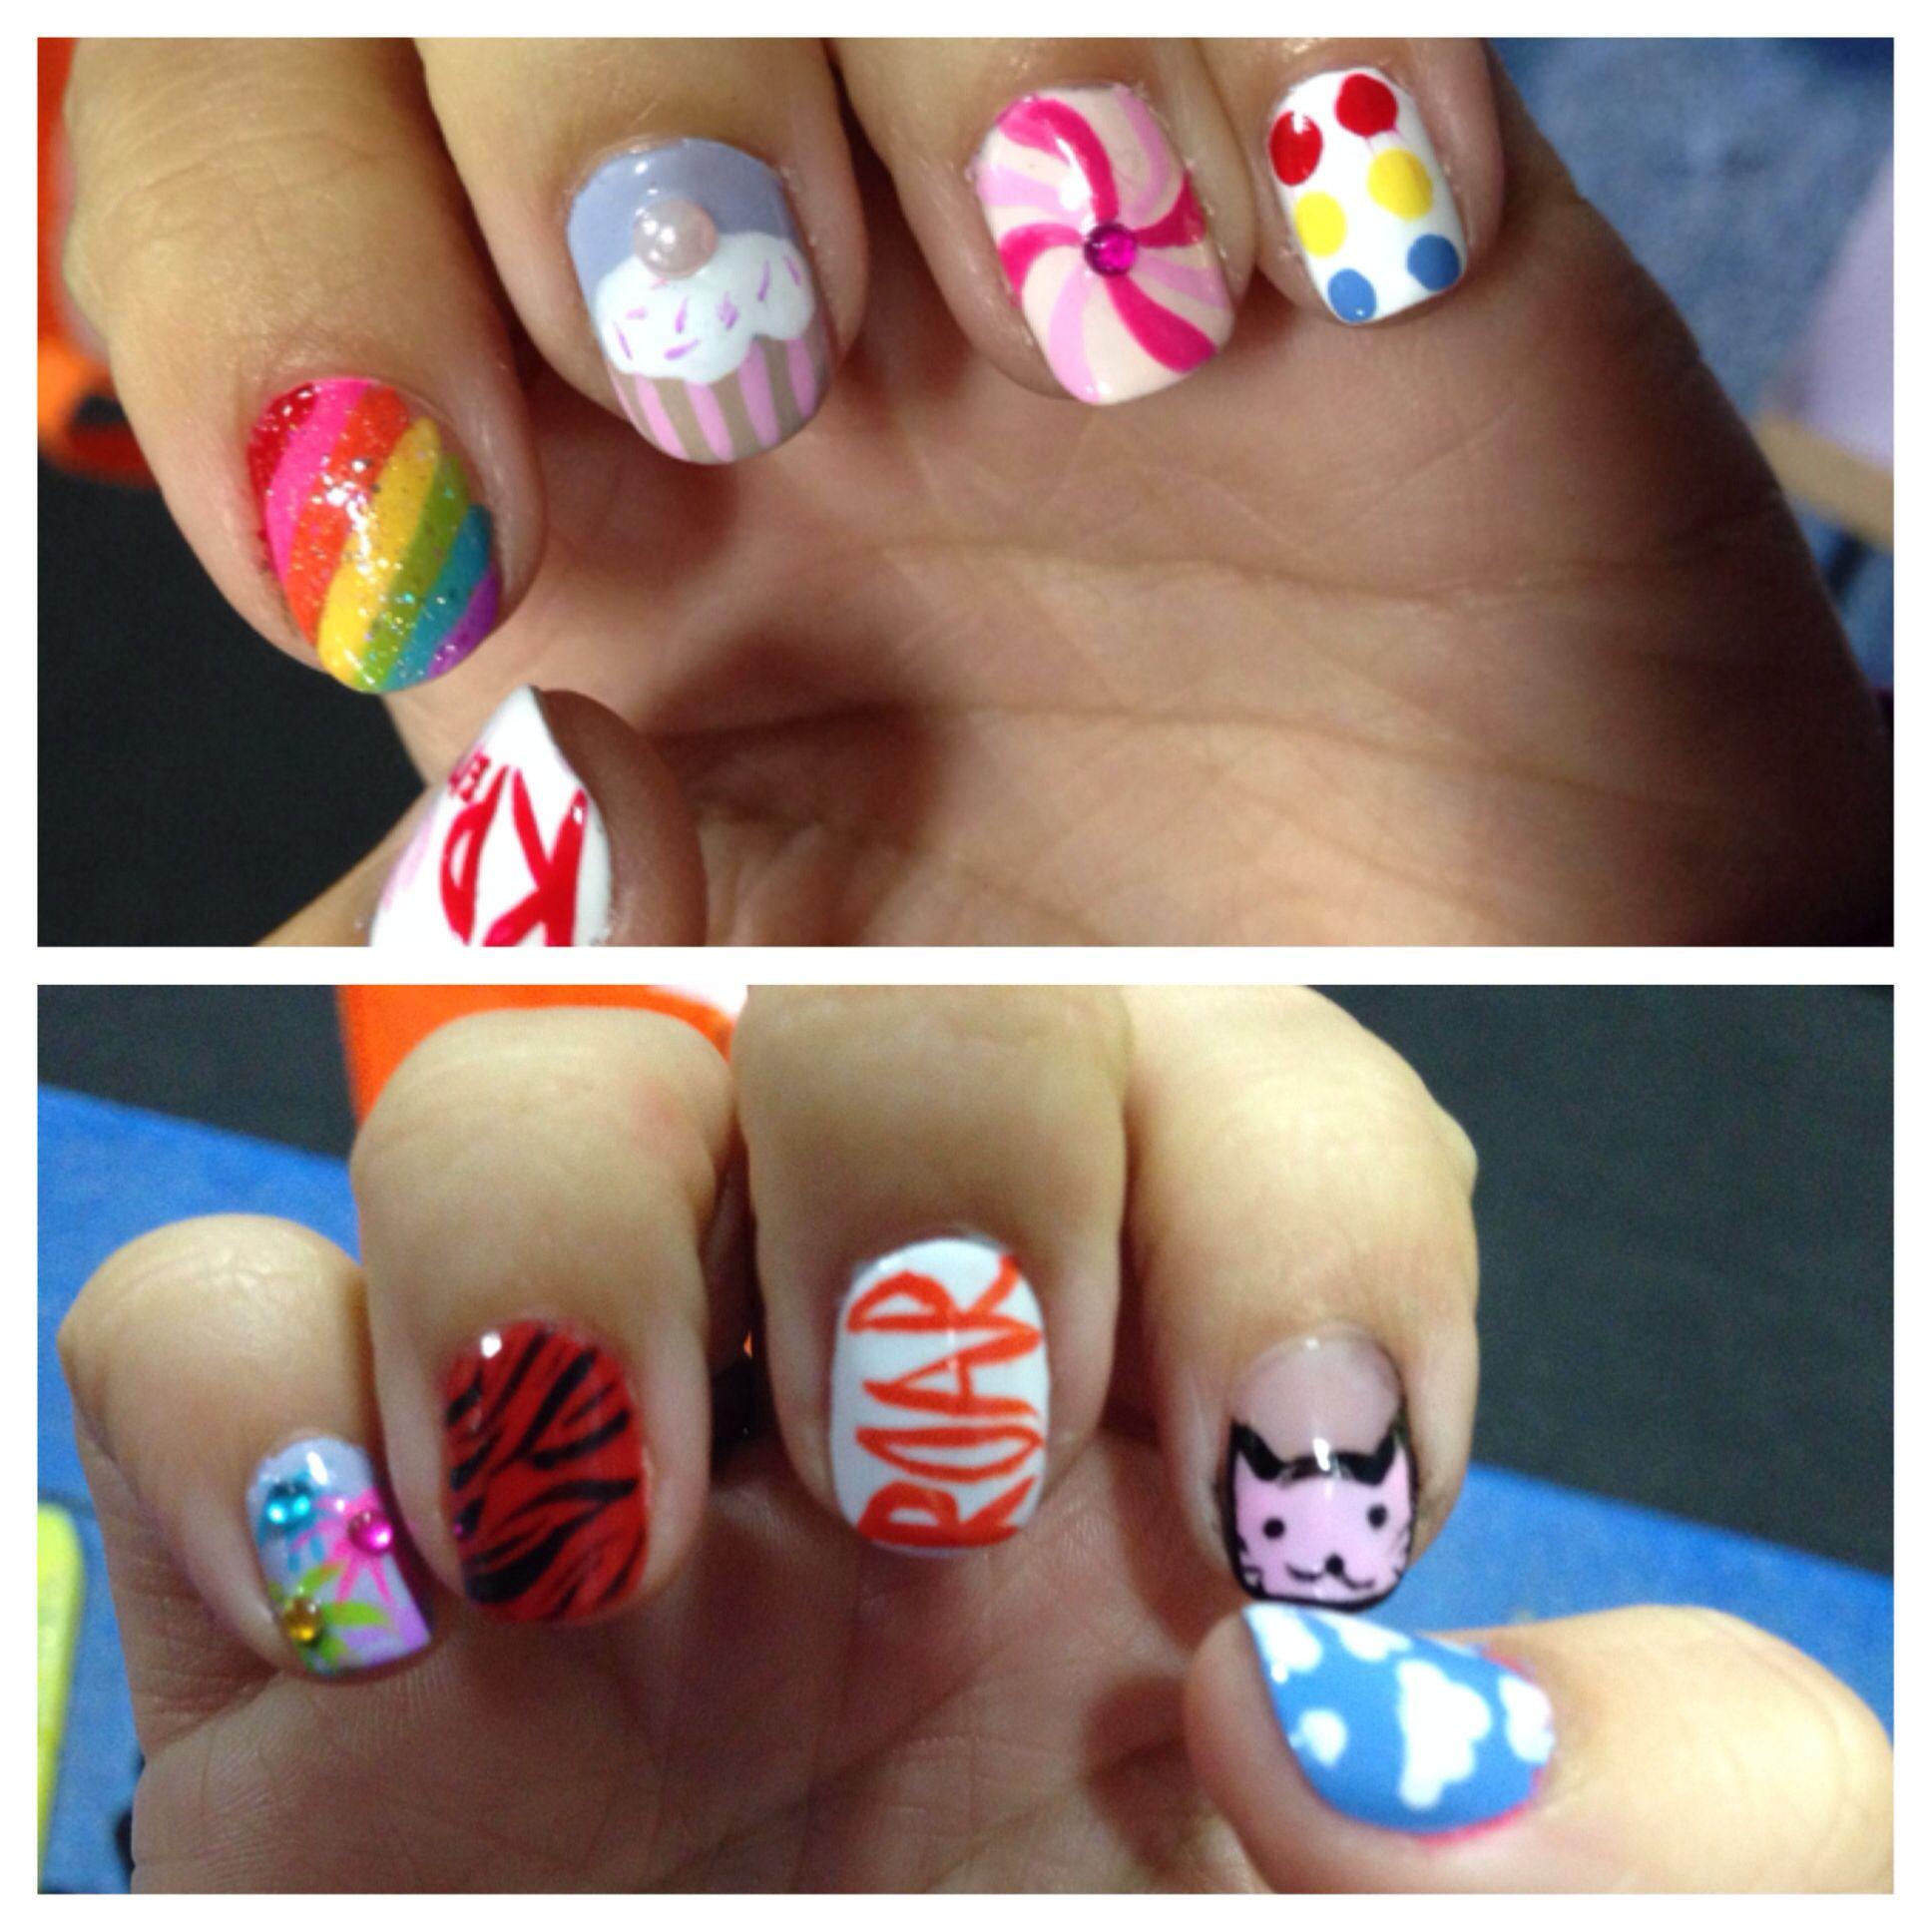 Katy Perry inspired nail art   Nail It!   Pinterest   Katy perry